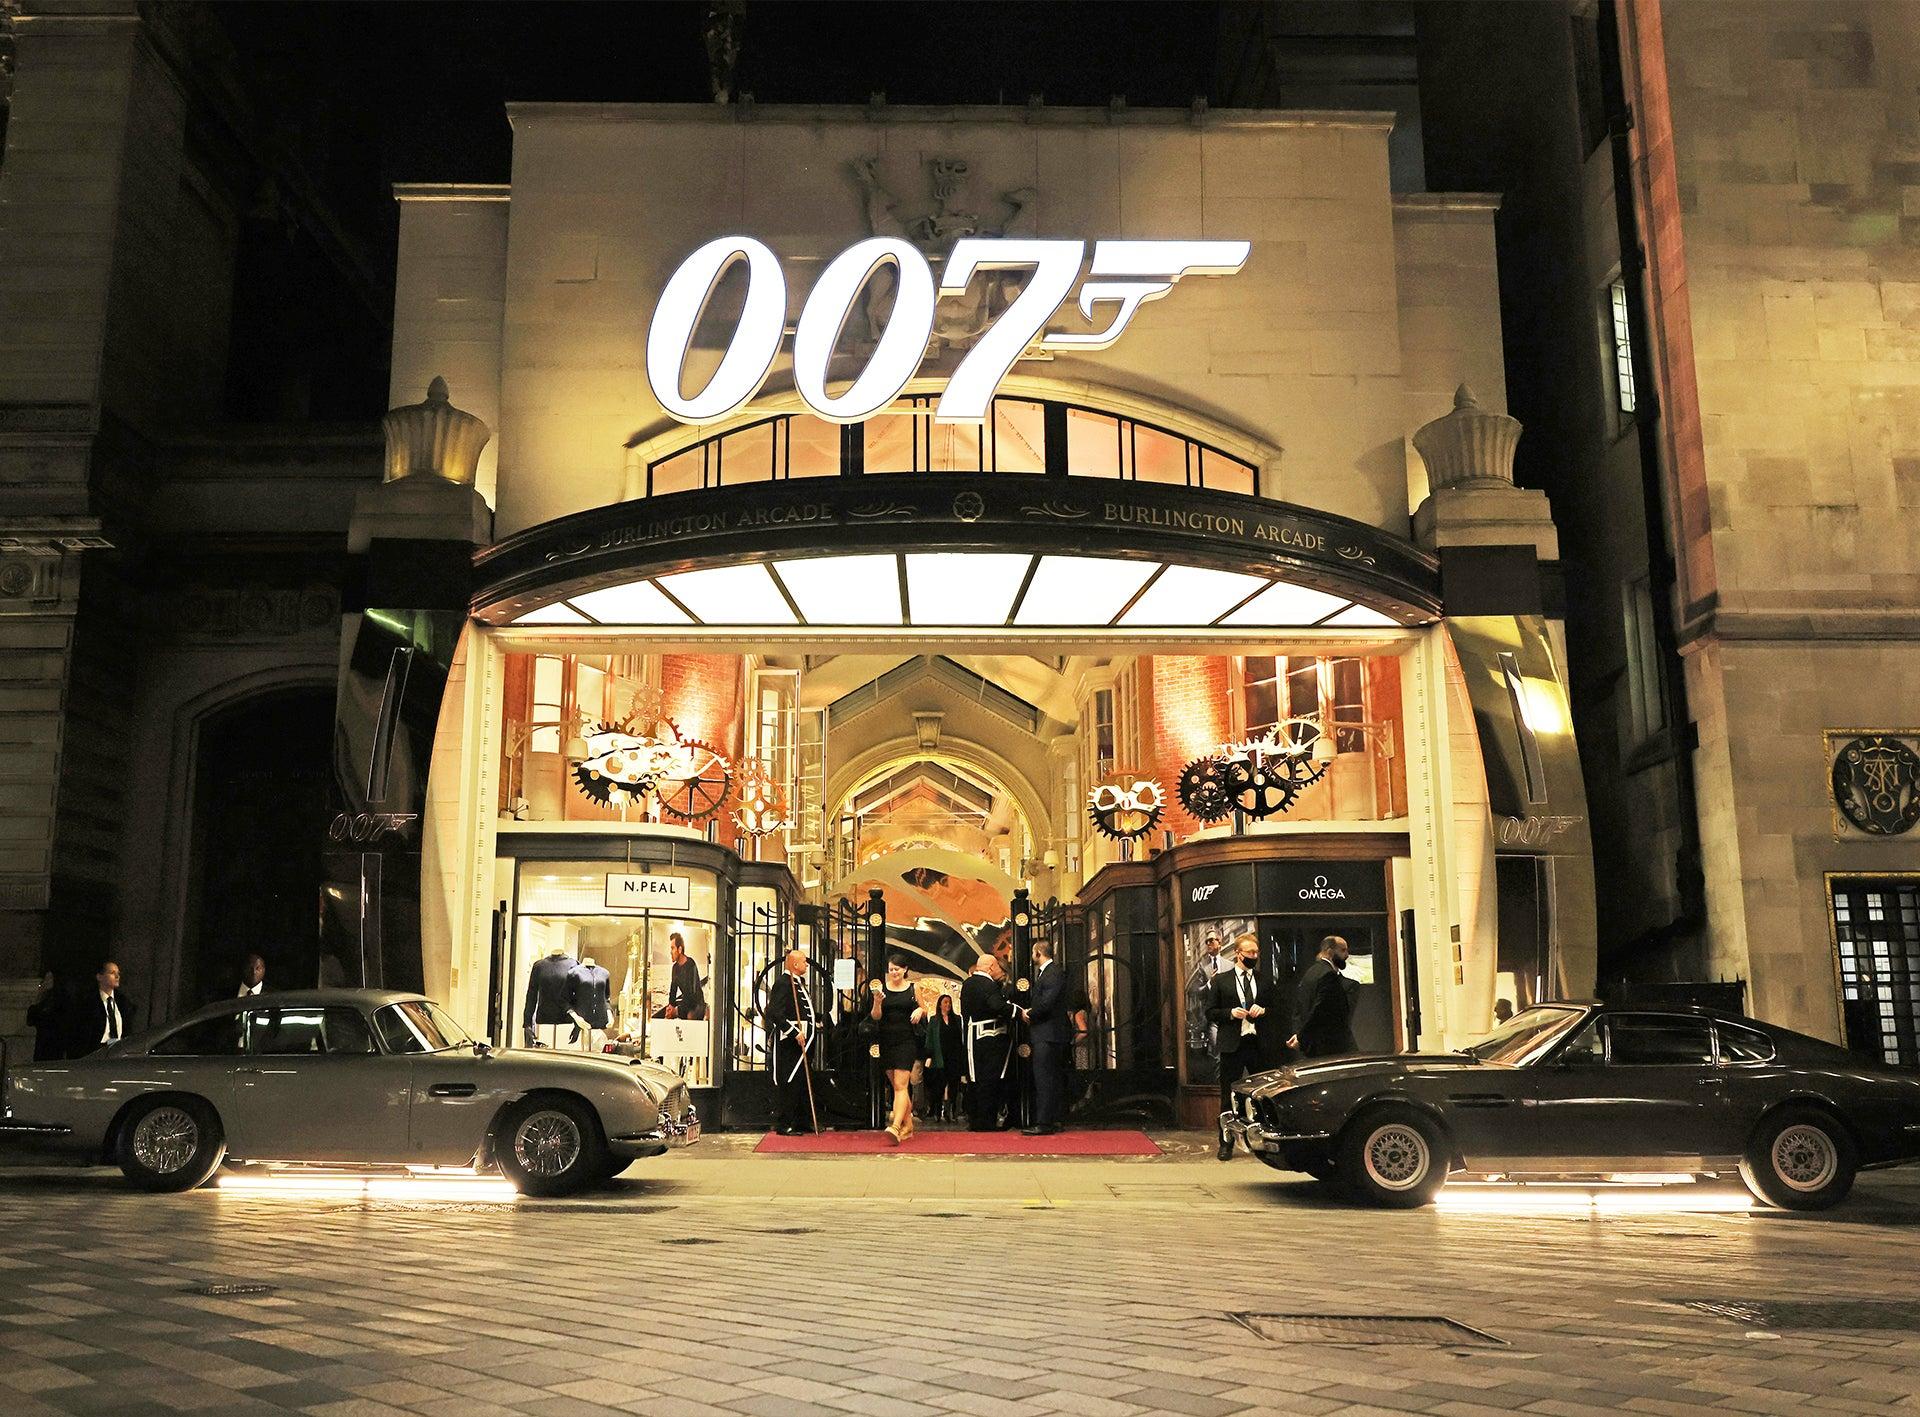 Burlington Arcade Launches 007 installation